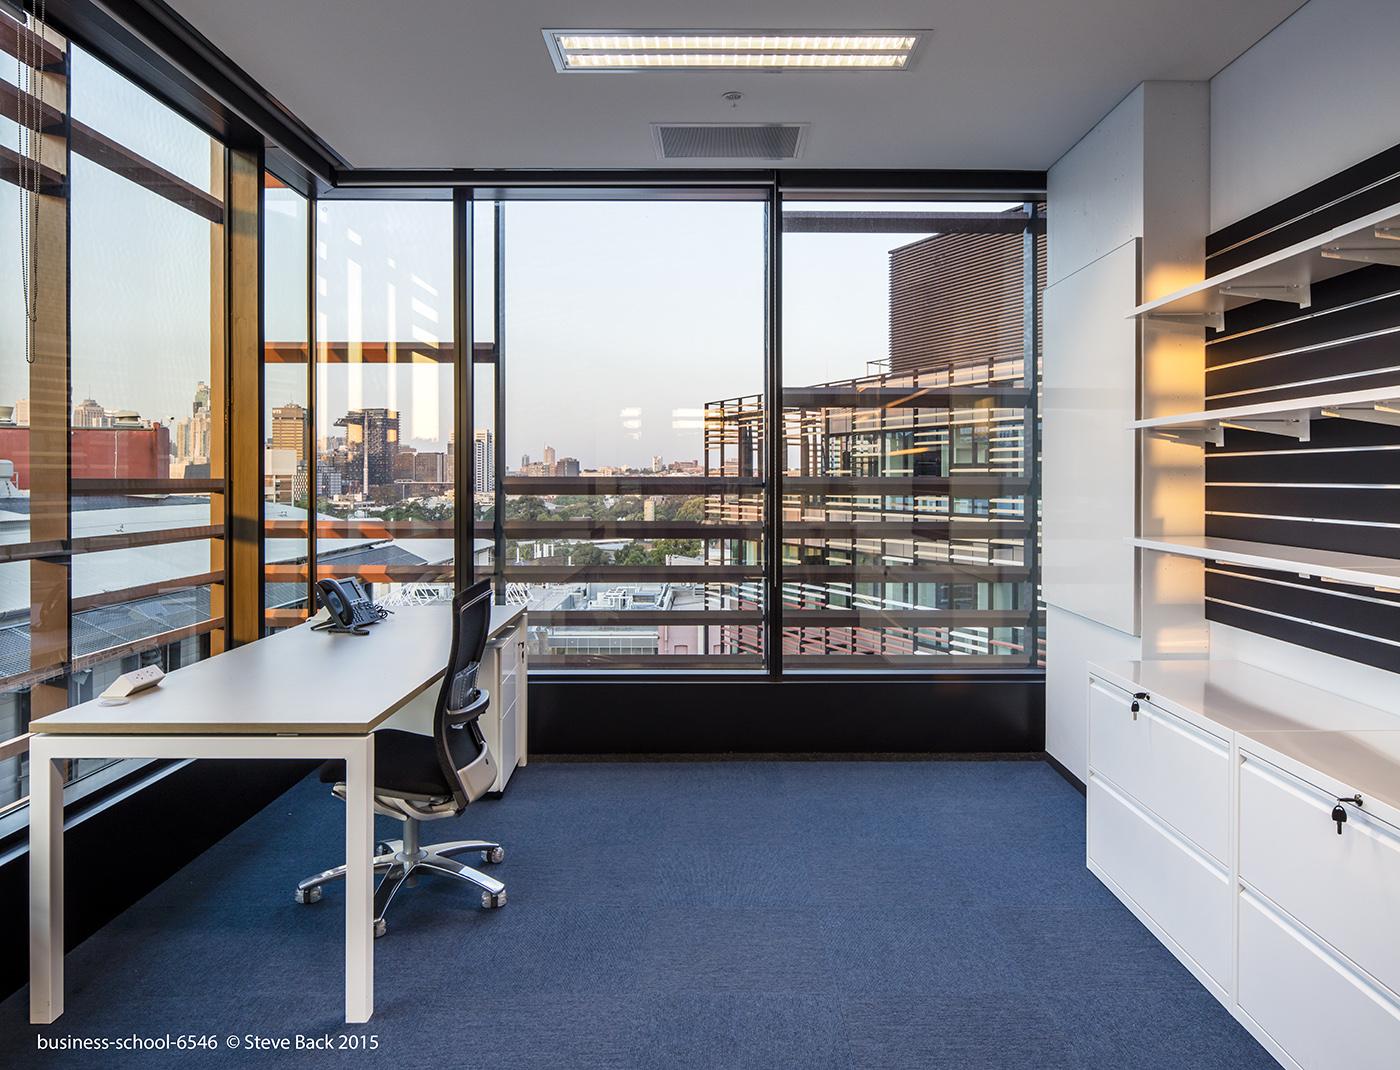 business-school-6546.jpg